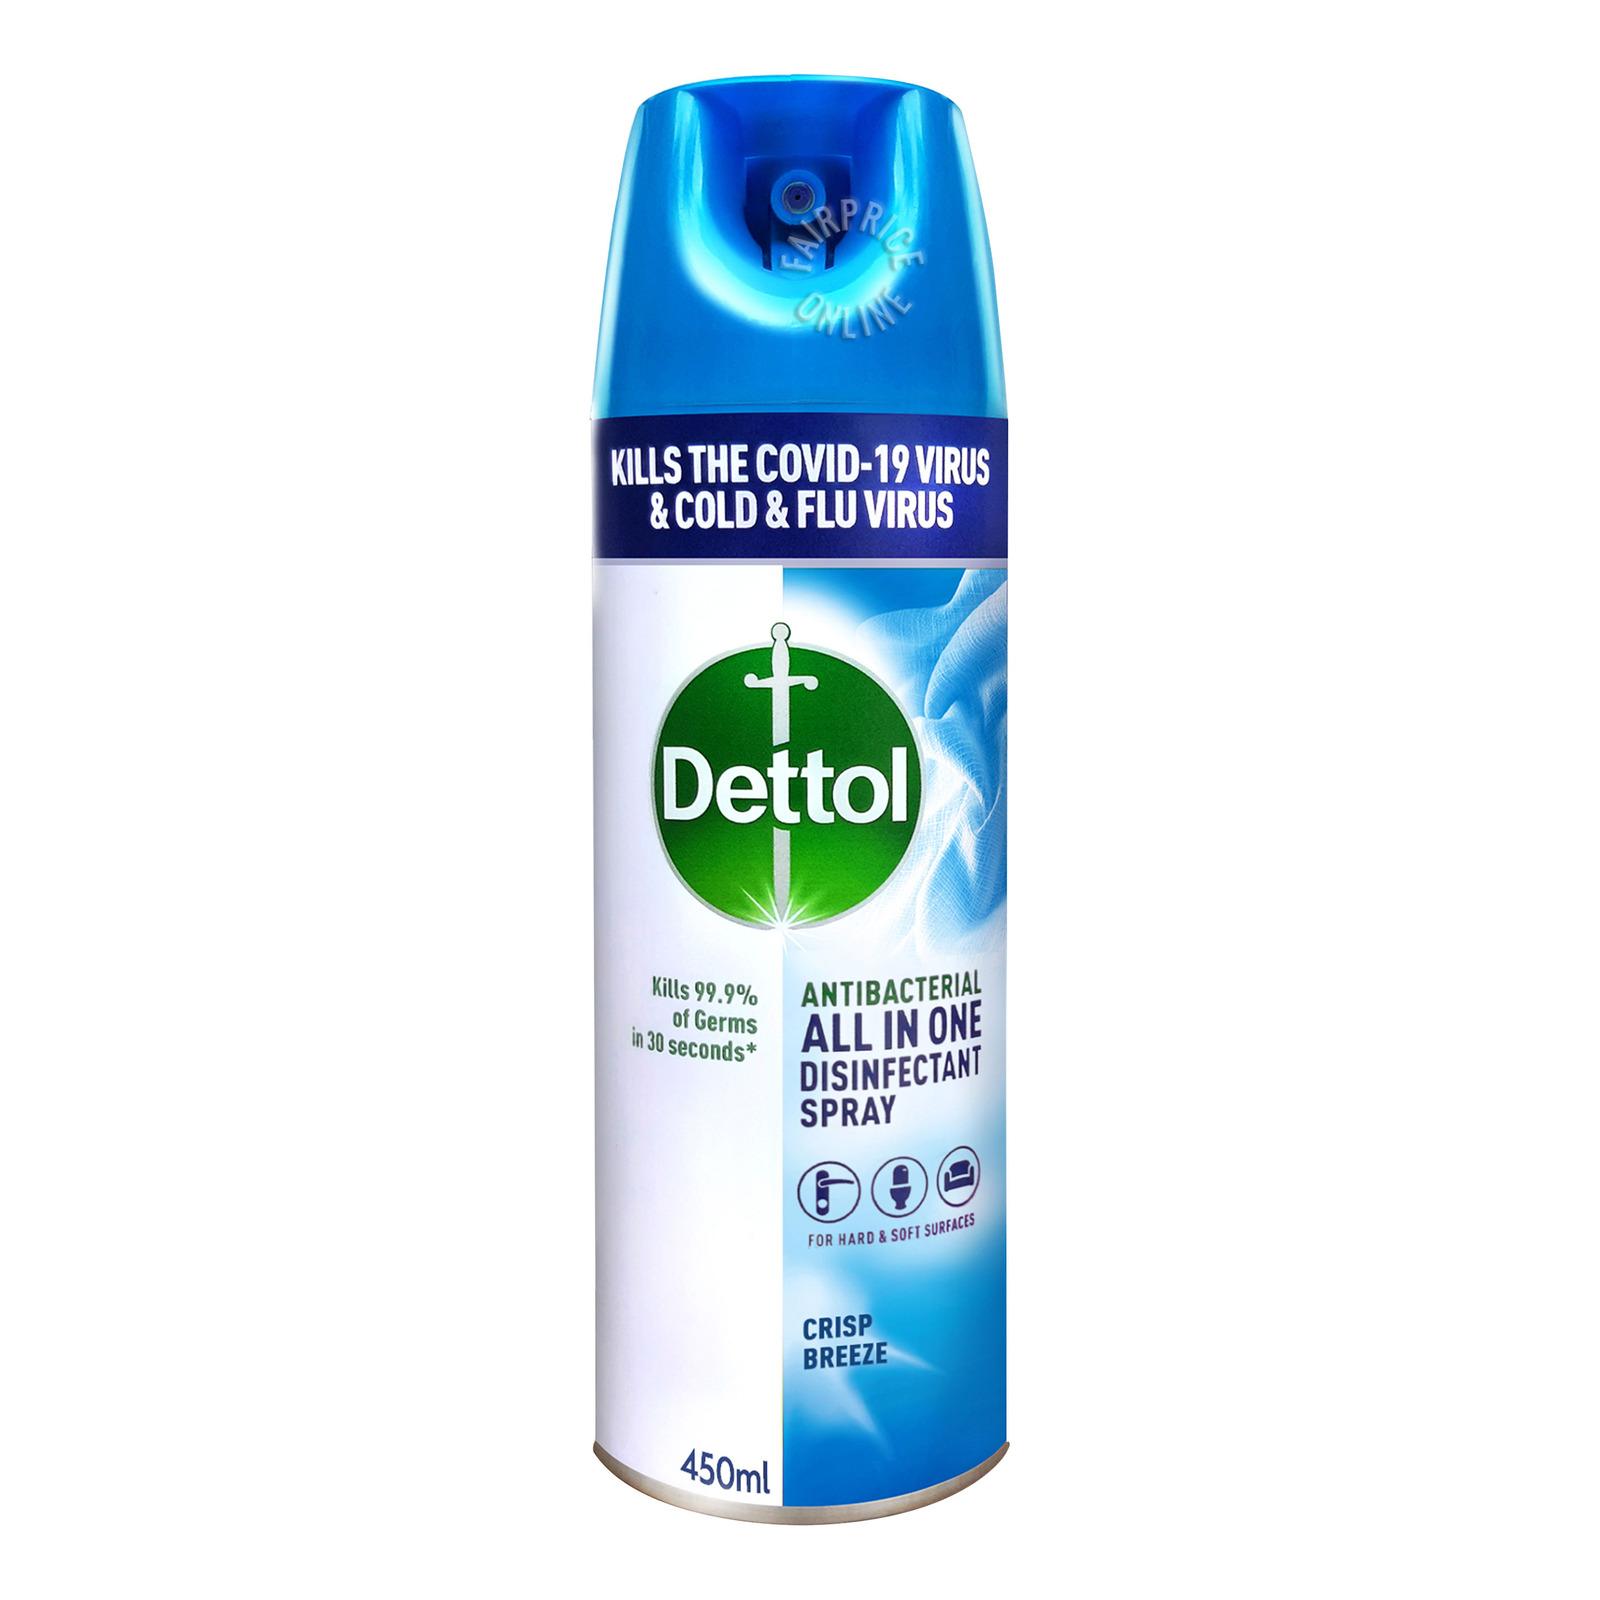 Dettol Disinfectant Spray - Crisp Breeze